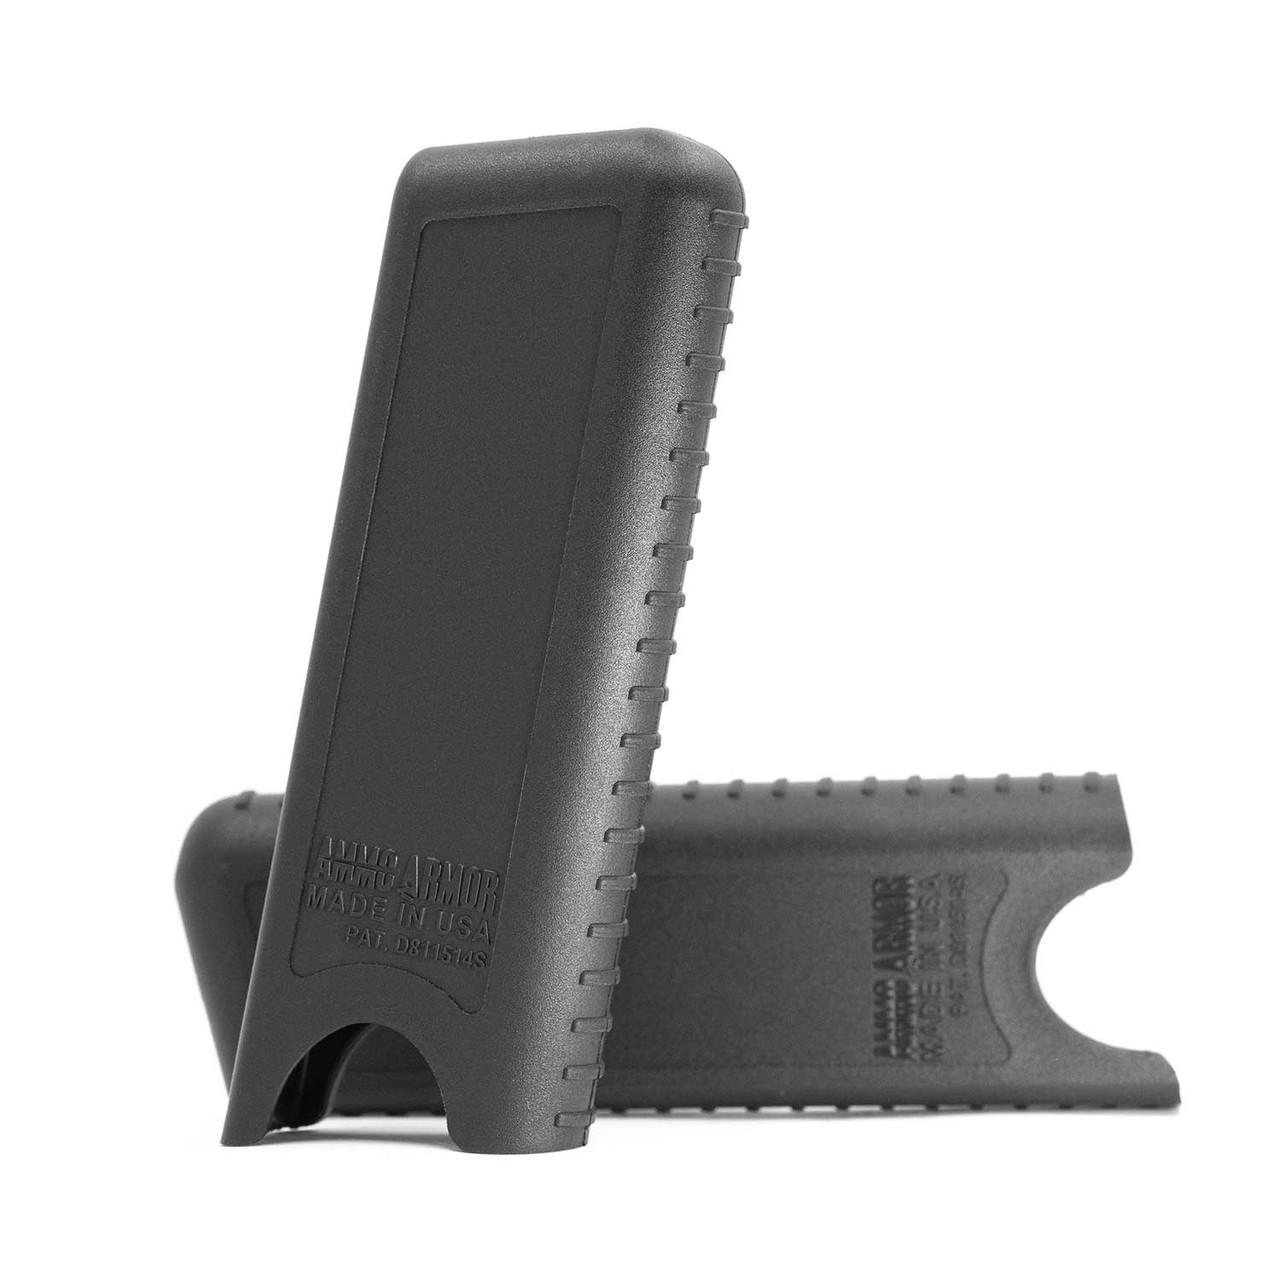 Springfield XDE 9mm Ammo Armor